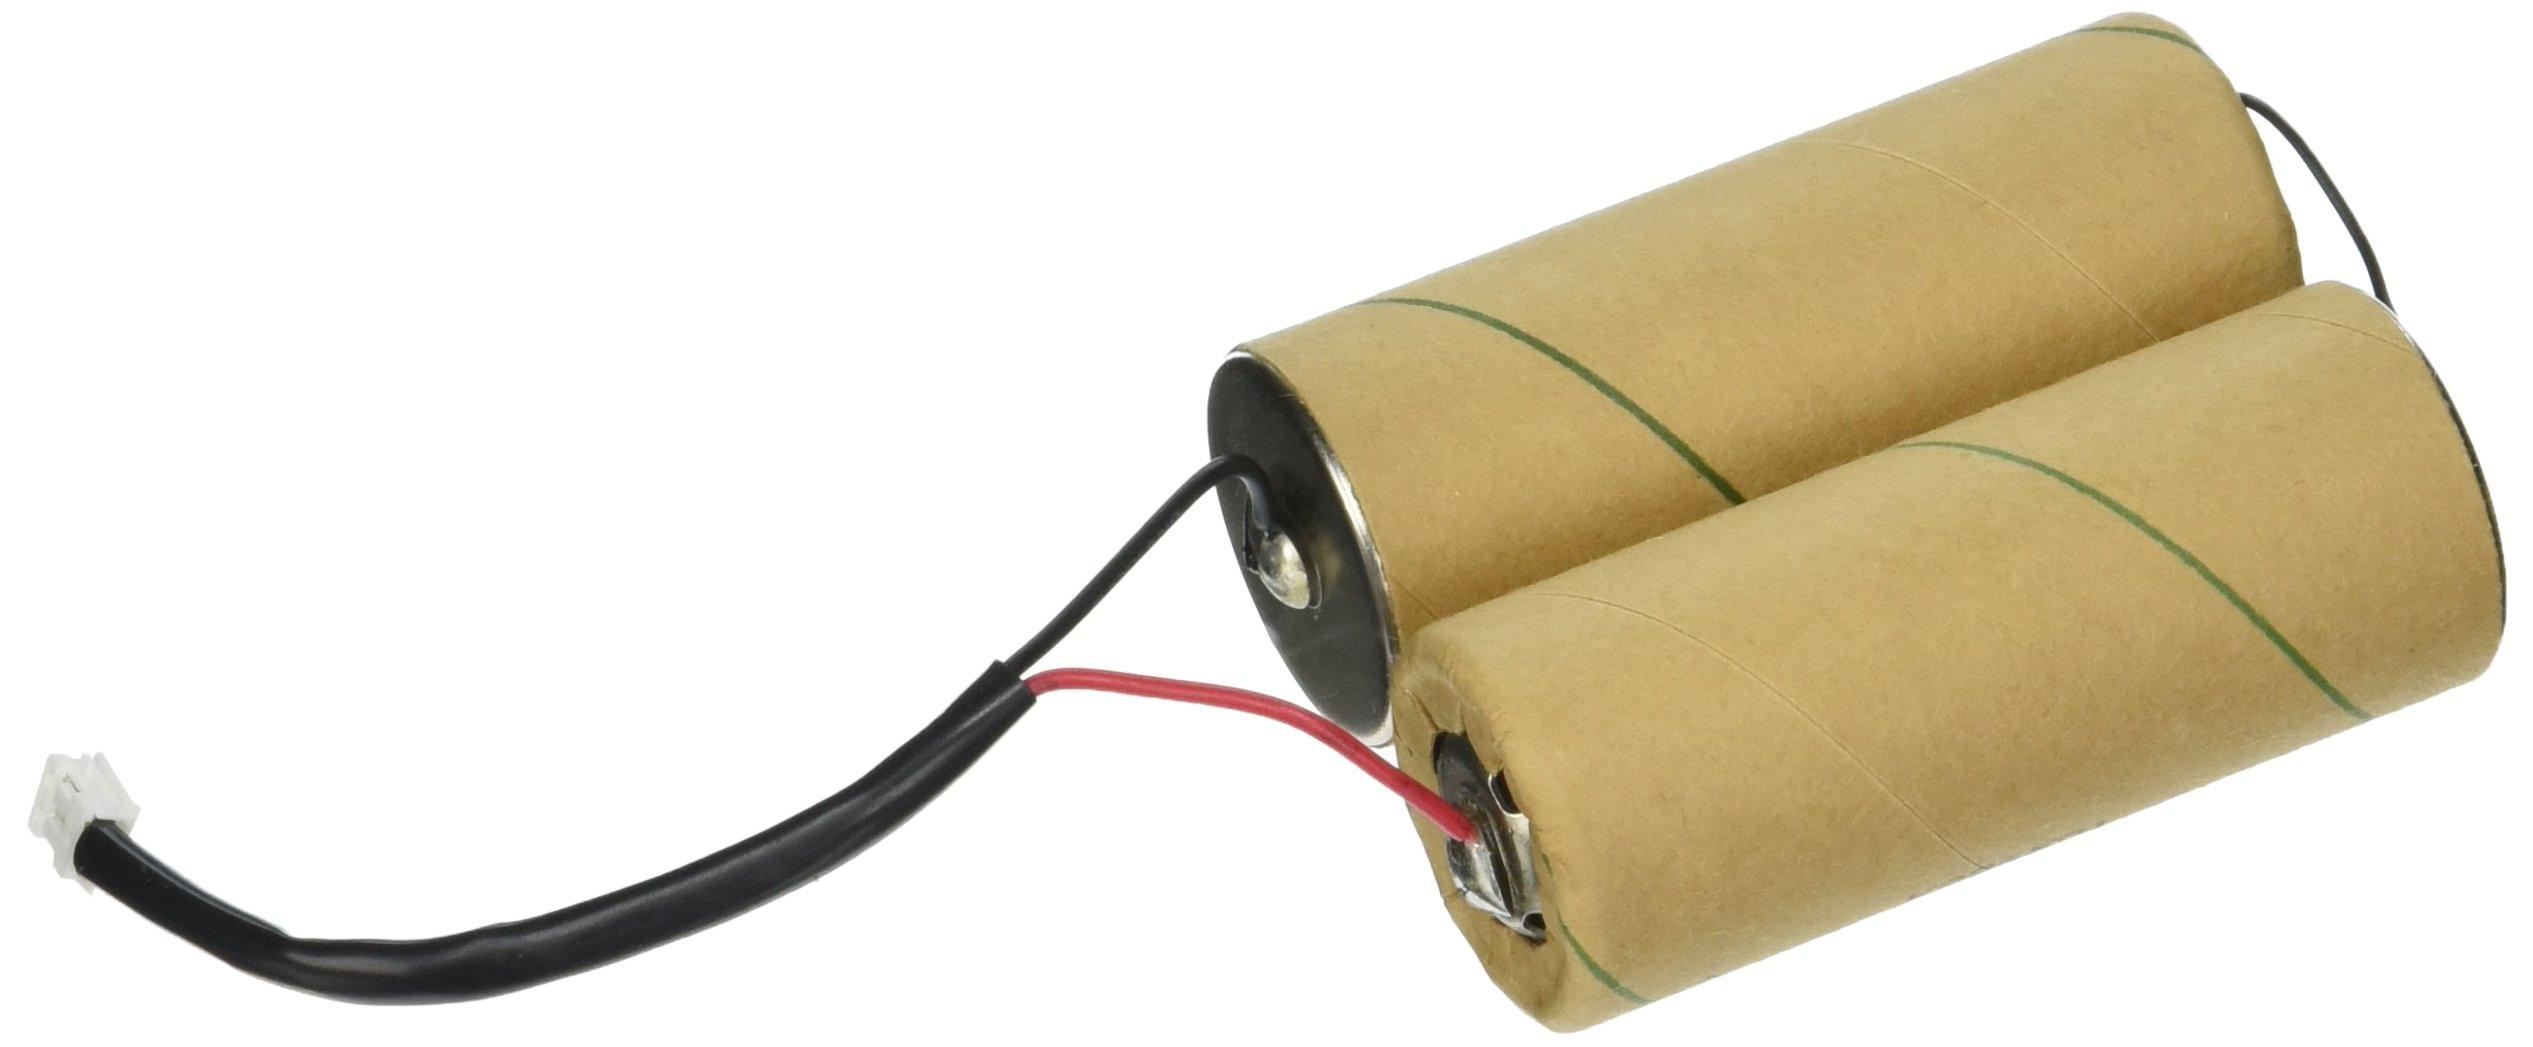 Battery - Fire Vulcan Led - Li Ion